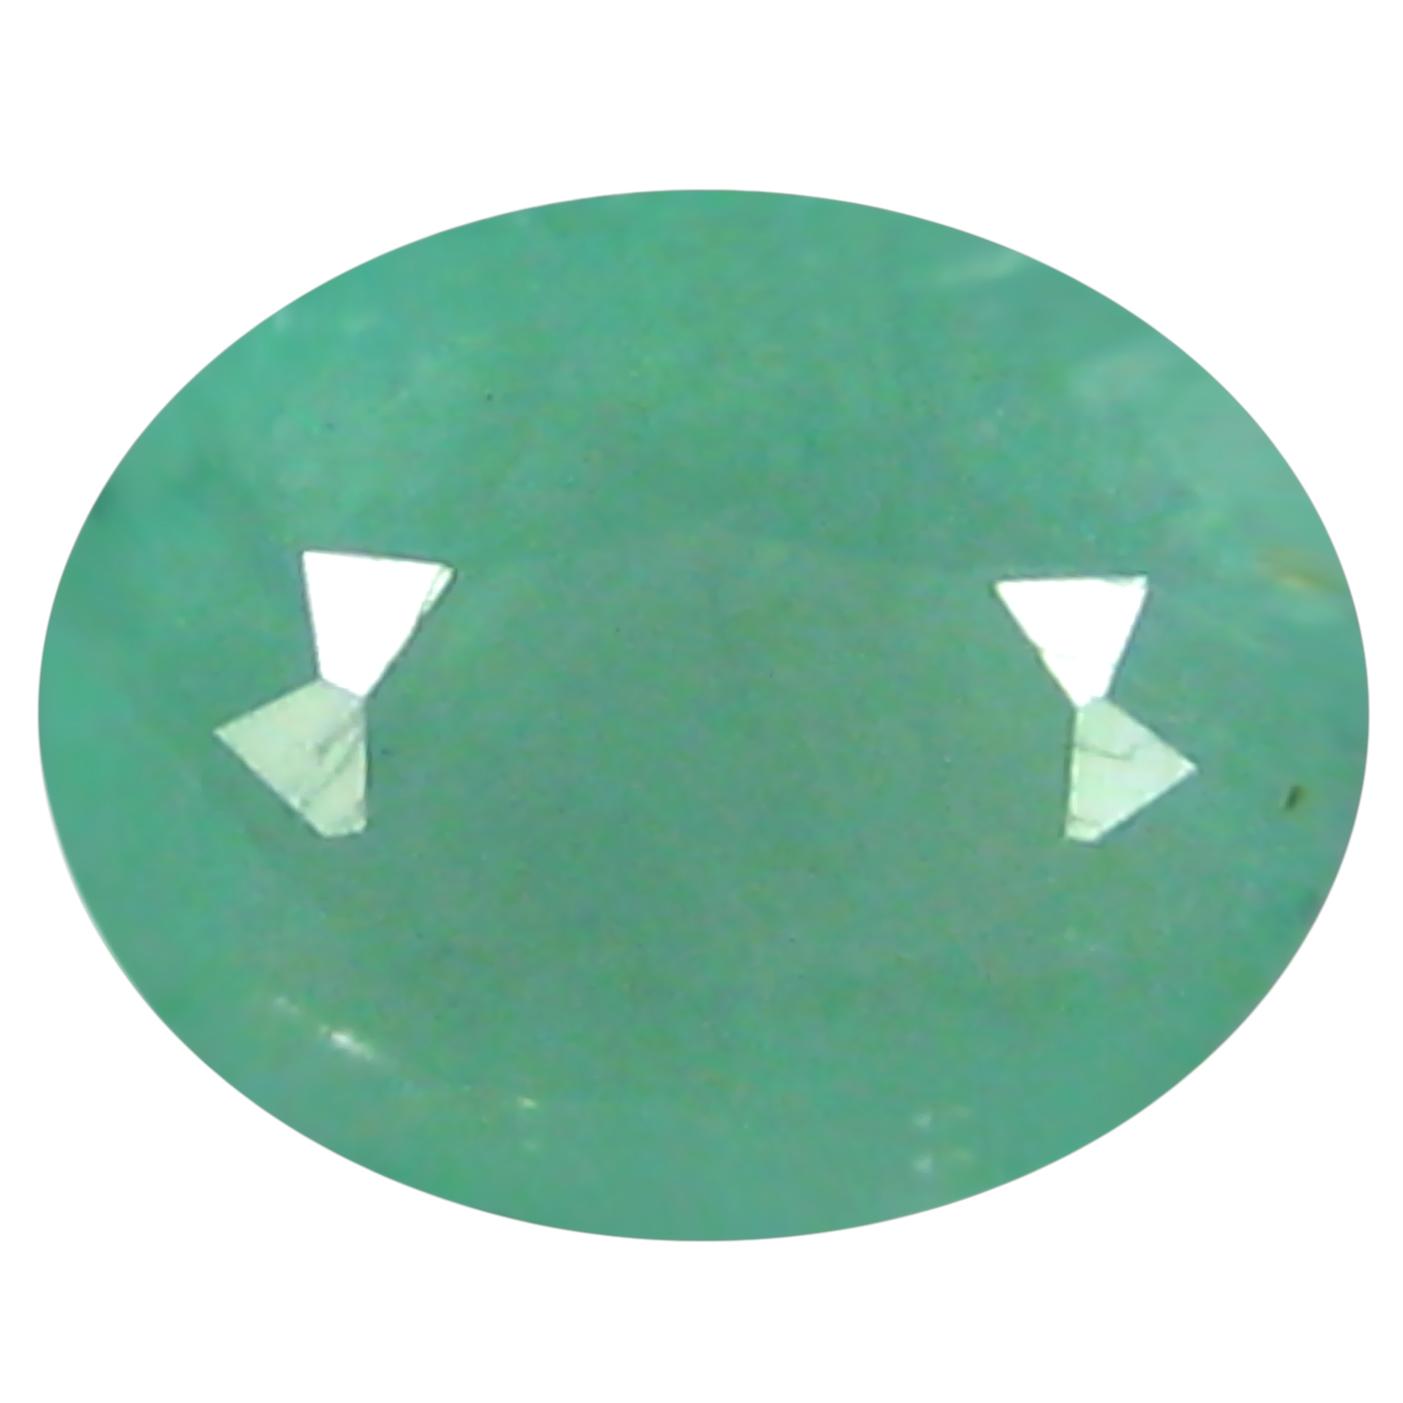 0.53 ct  Five-star Oval Shape (6 x 5 mm) Bluish Green Grandidierite Natural Gemstone